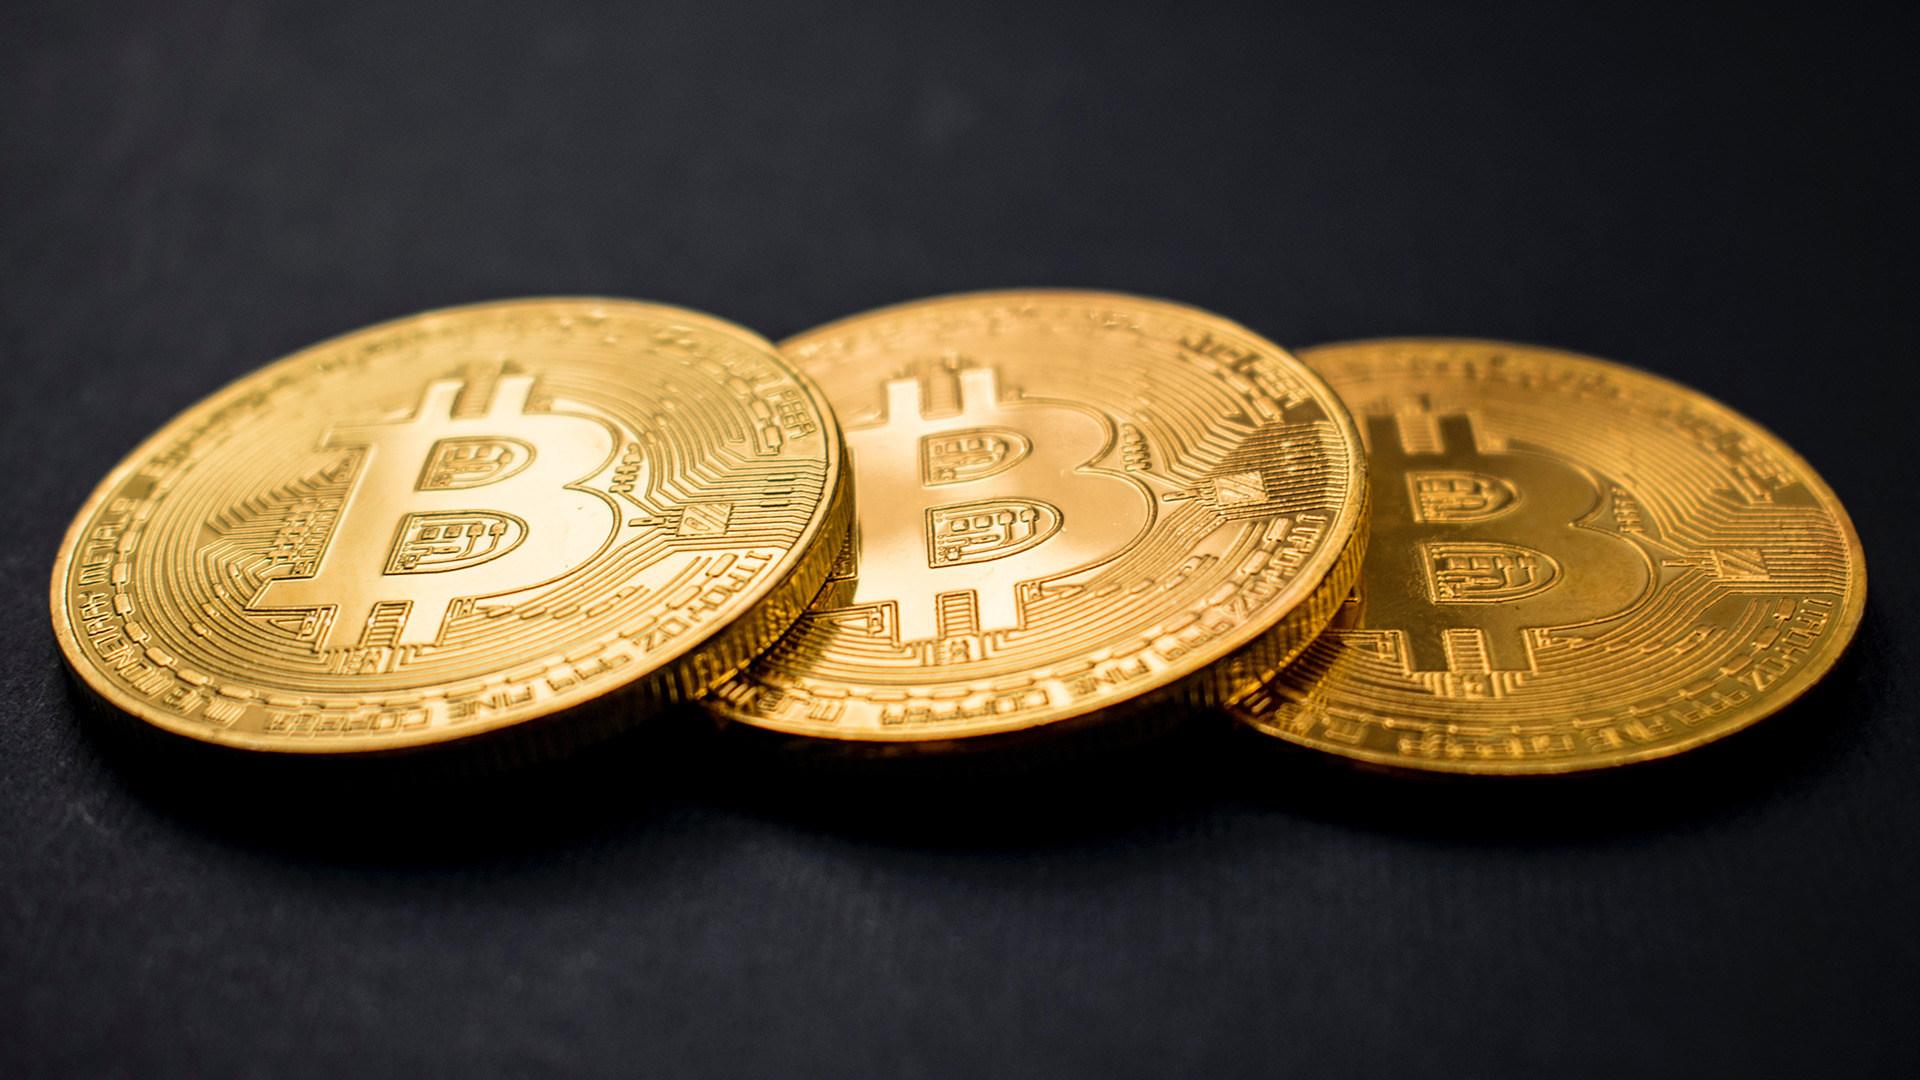 Bitcoin, Geld, Kryptowährung, Währung, Bitcoins, virtuelle Währung, Münzen